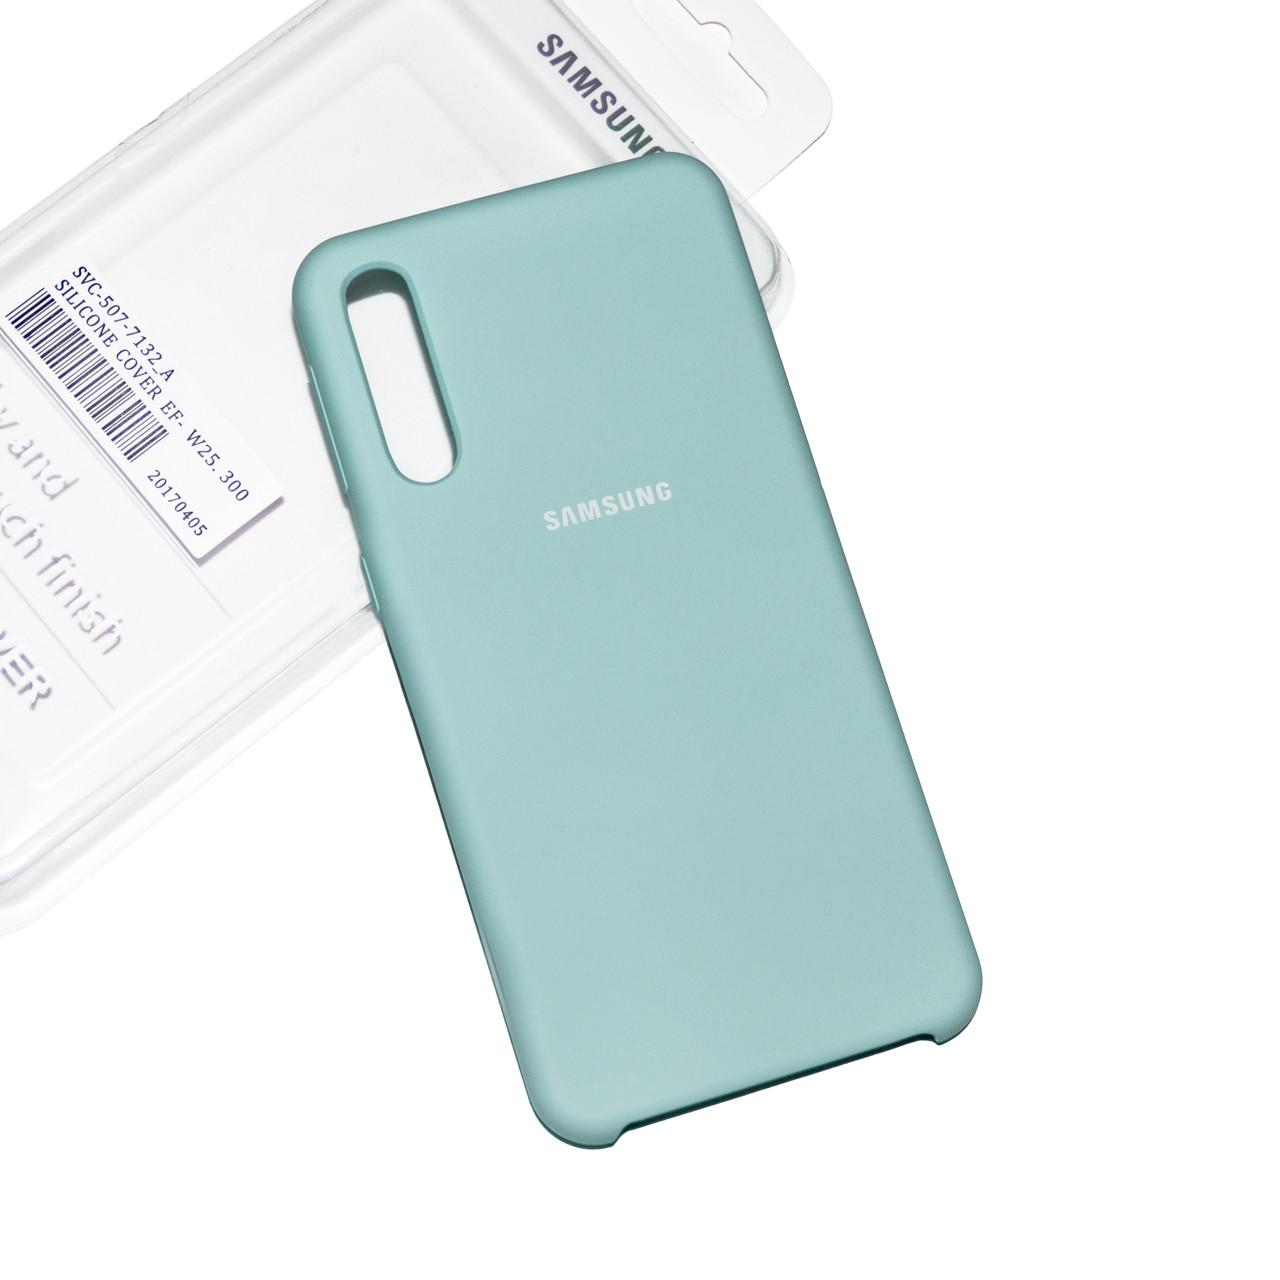 Силиконовый чехол на Samsung A50 (A505) Soft-touch Mint